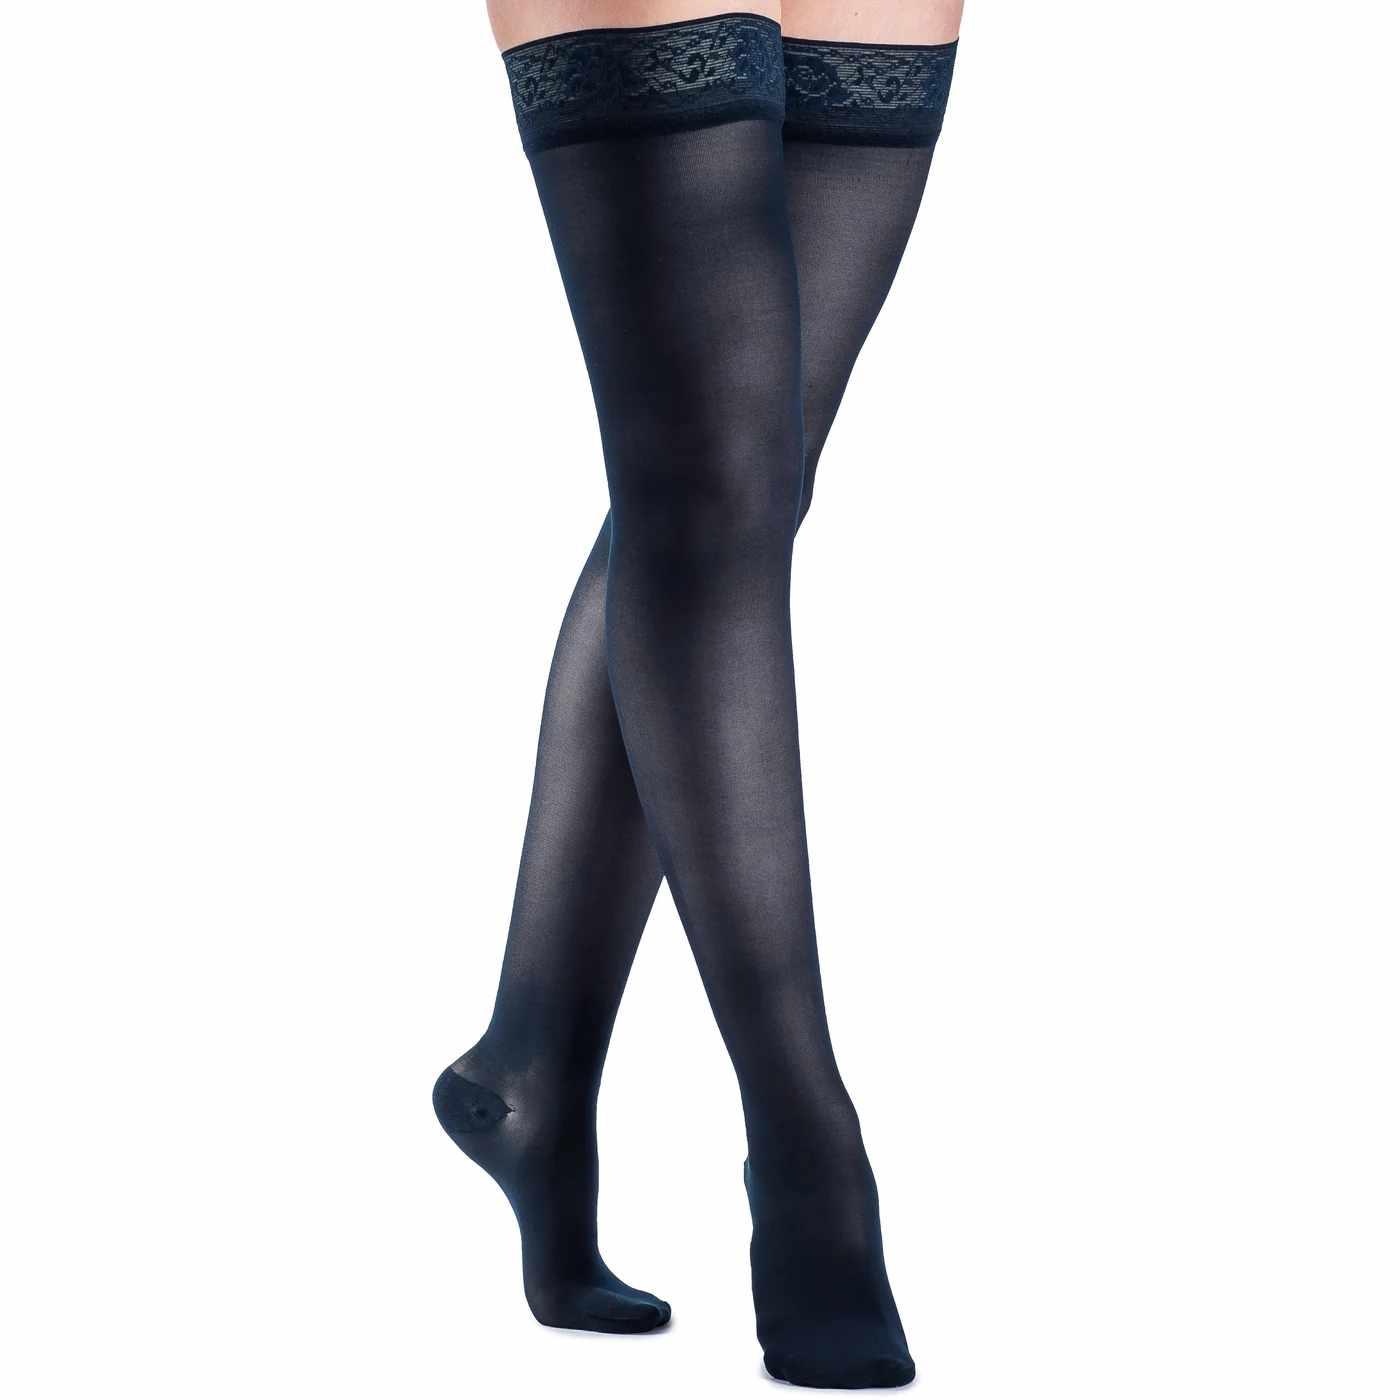 Sigvaris EverSheer Compression Stocking, Thigh-High, Closed Toe, Medium Short 20-30 mmHg- Pair